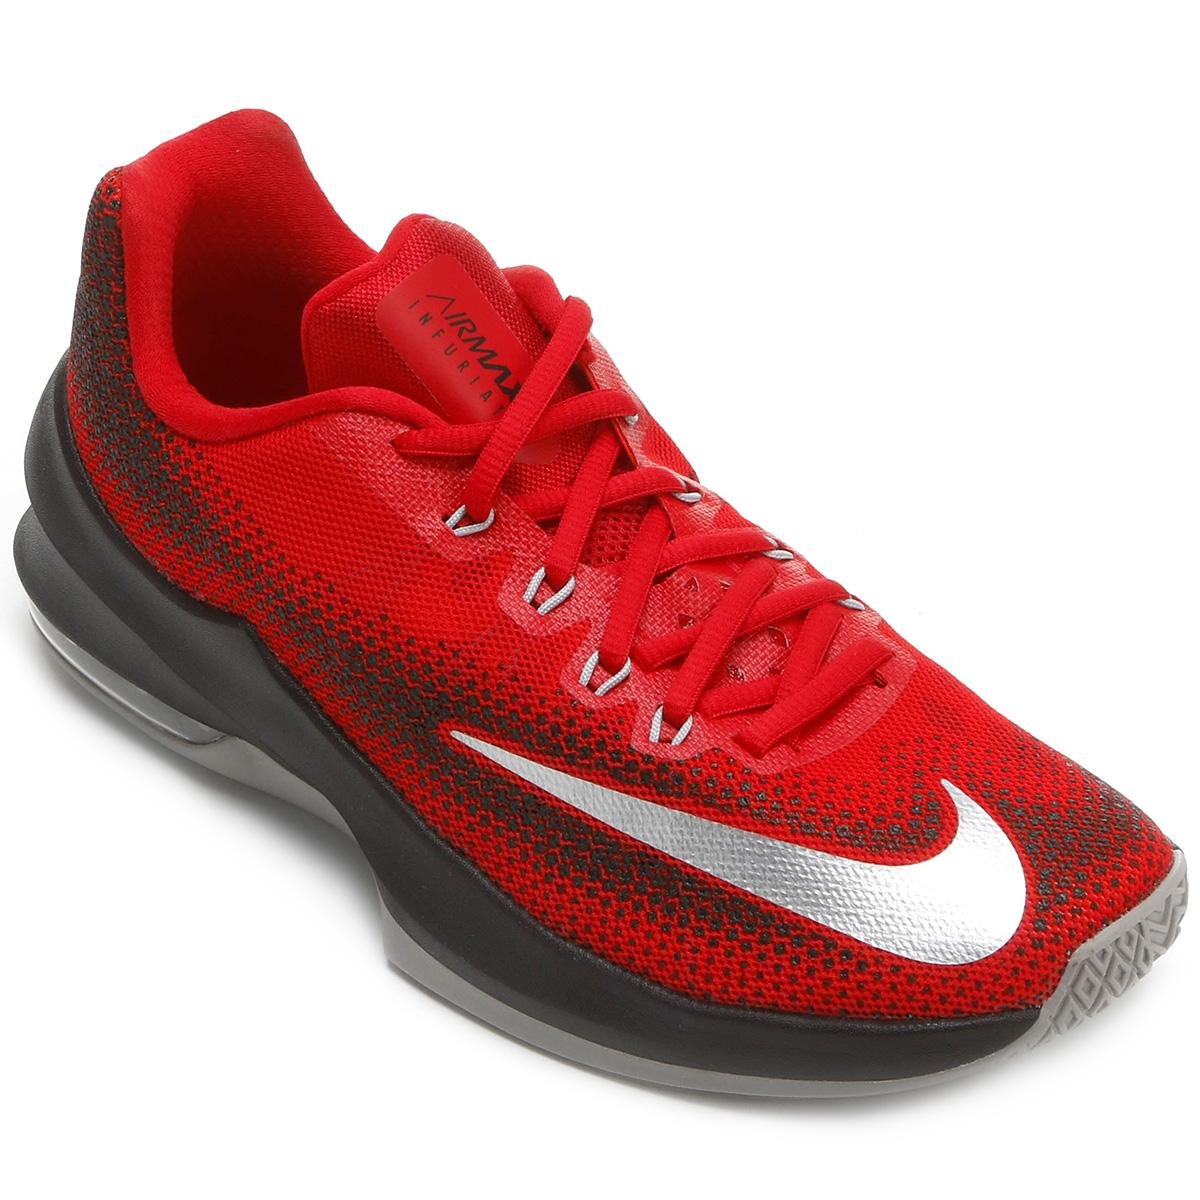 ace0471bef3d ... australia tênis nike air max infuriate low masculino vermelho e preto  29f4f 7bd4a